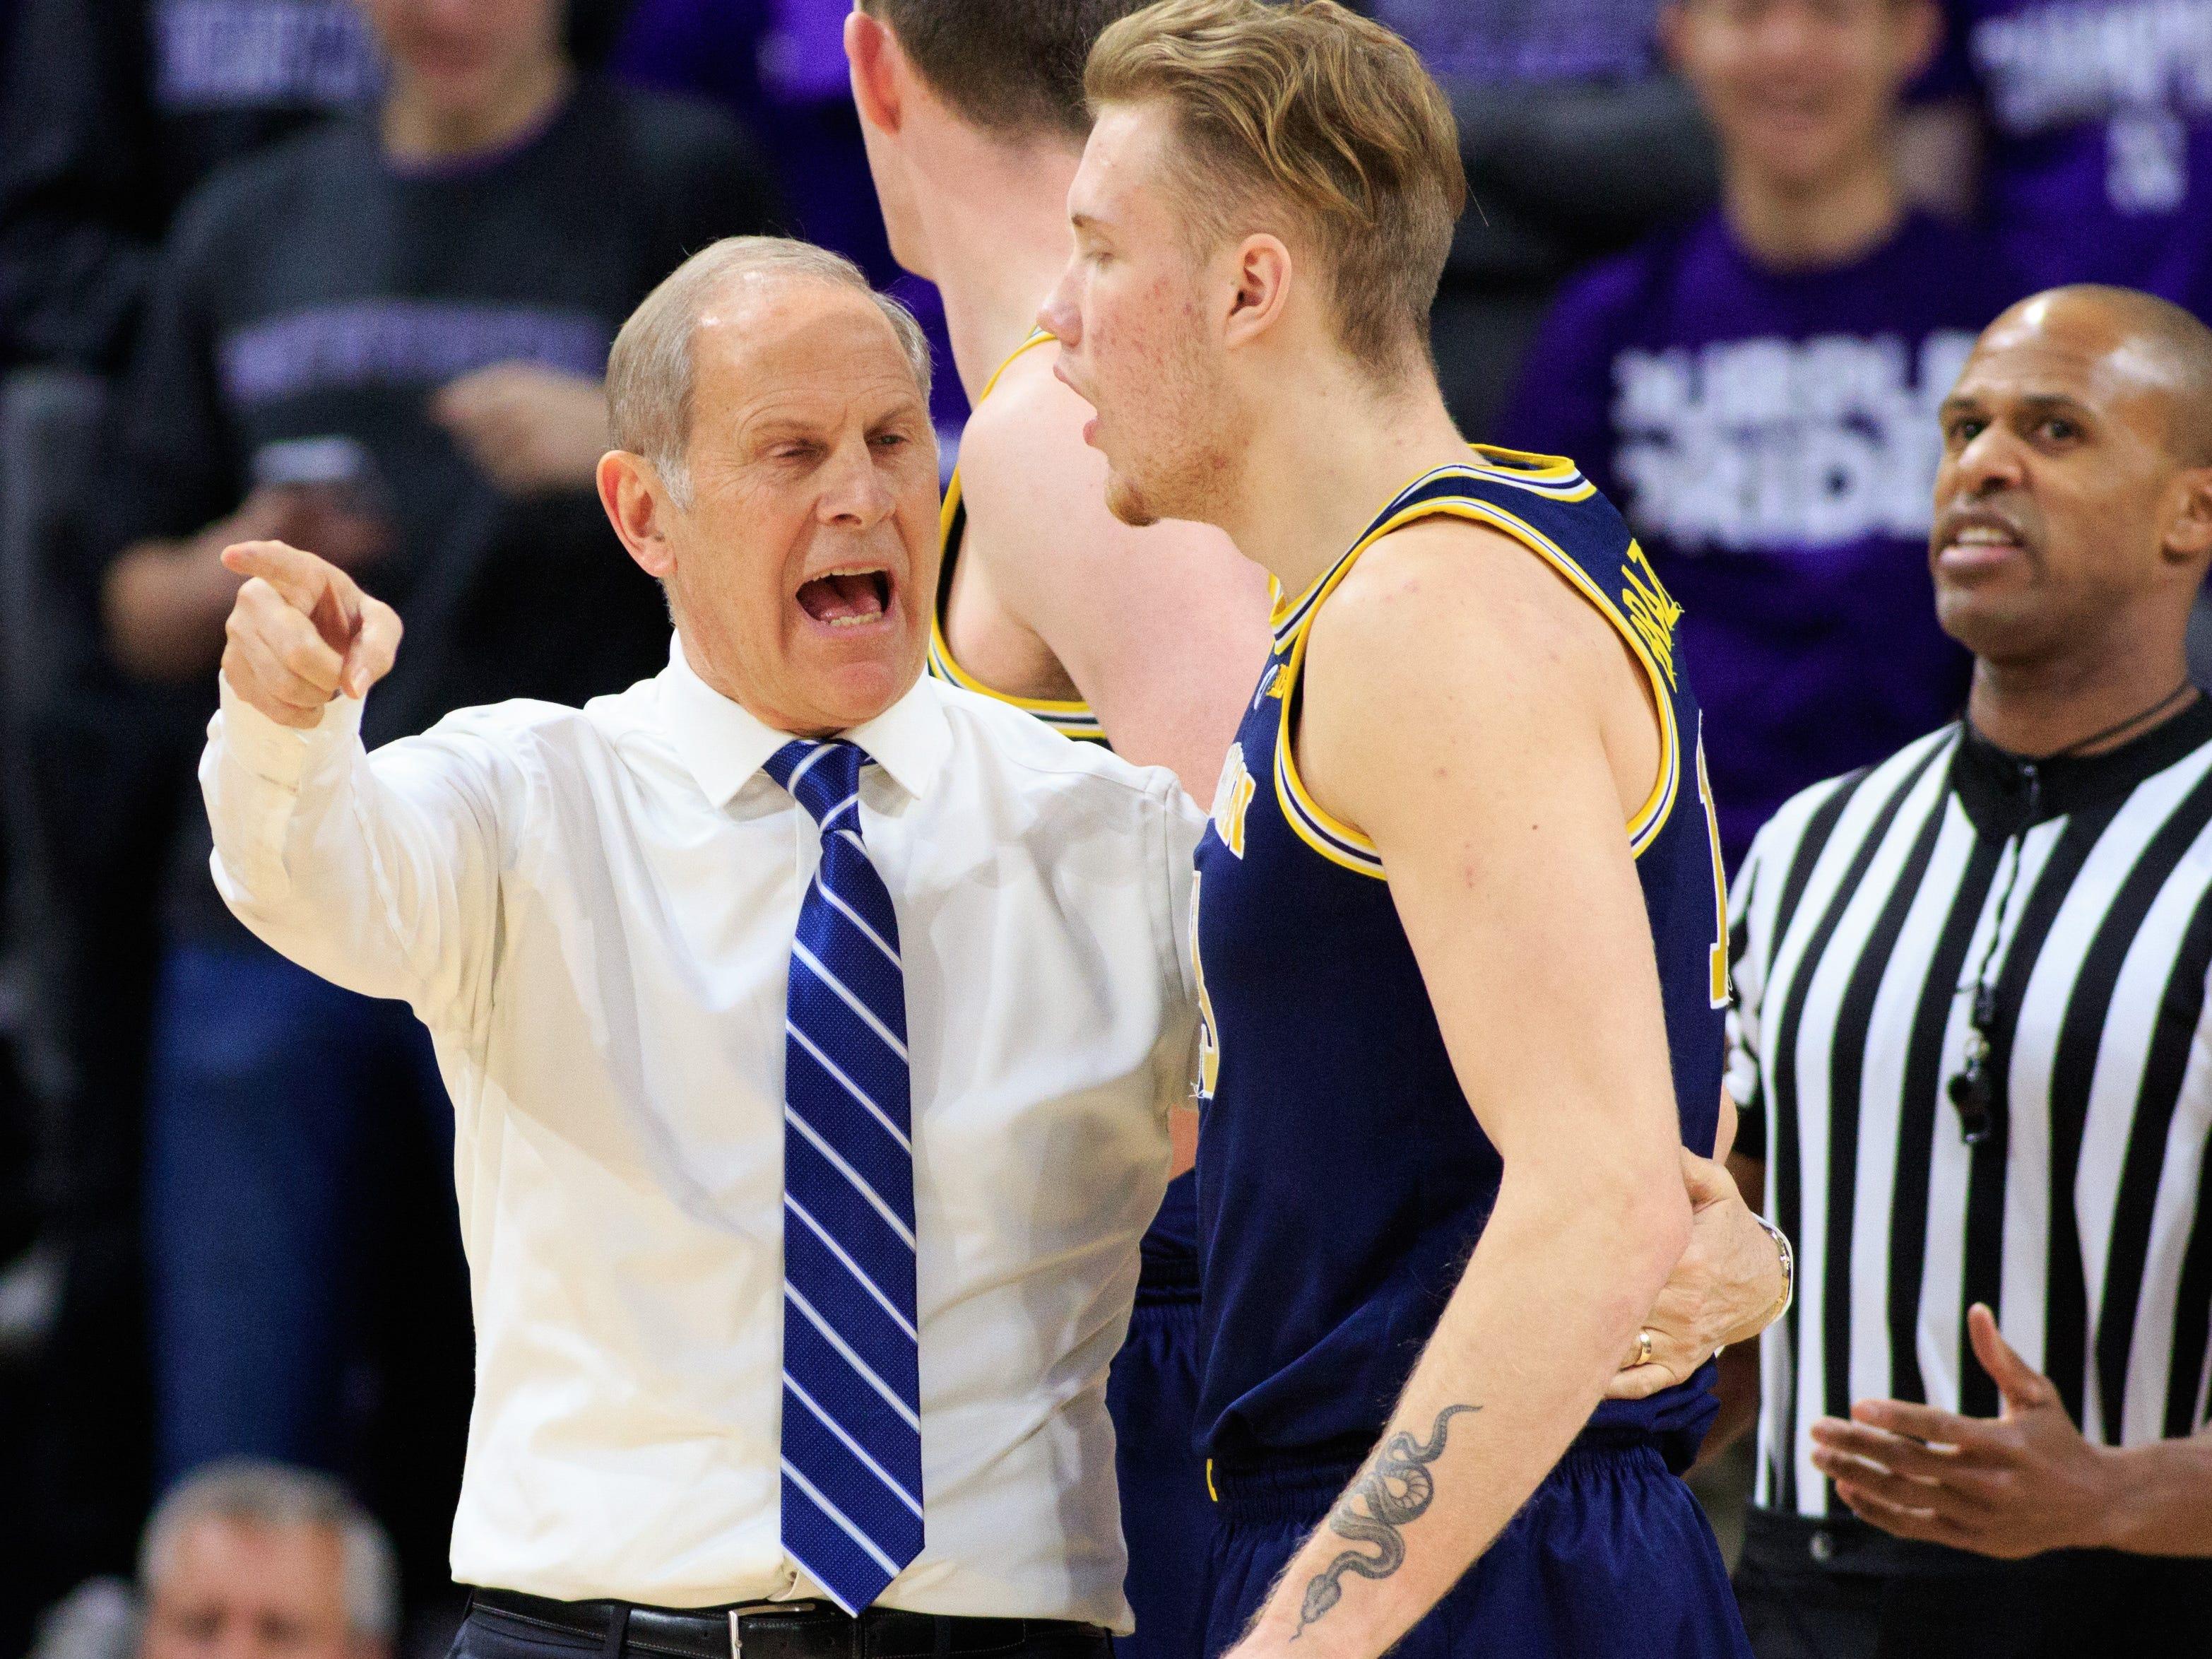 Michigan coach John Beilein talks to Ignas Brazdeikis during a timeout against Northwestern at Welsh-Ryan Arena on Dec. 4, 2018 in Evanston, Ill.